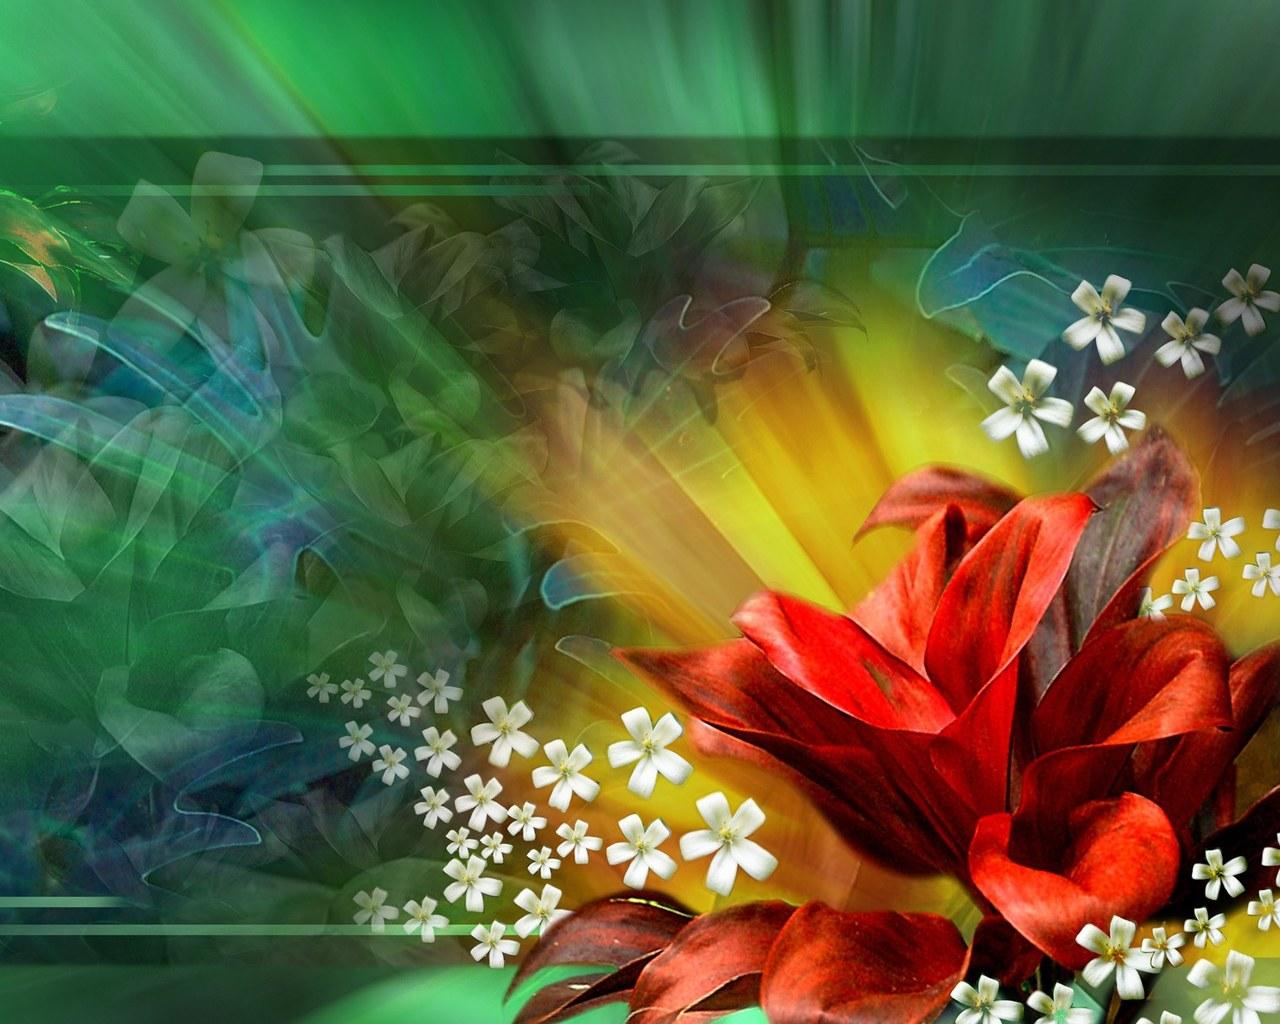 http://2.bp.blogspot.com/-lfTsmNxyNTs/Tj8Co-r0VlI/AAAAAAAAKmU/AiwaxC9MY2I/s1600/animation+wallpaper_3.jpg